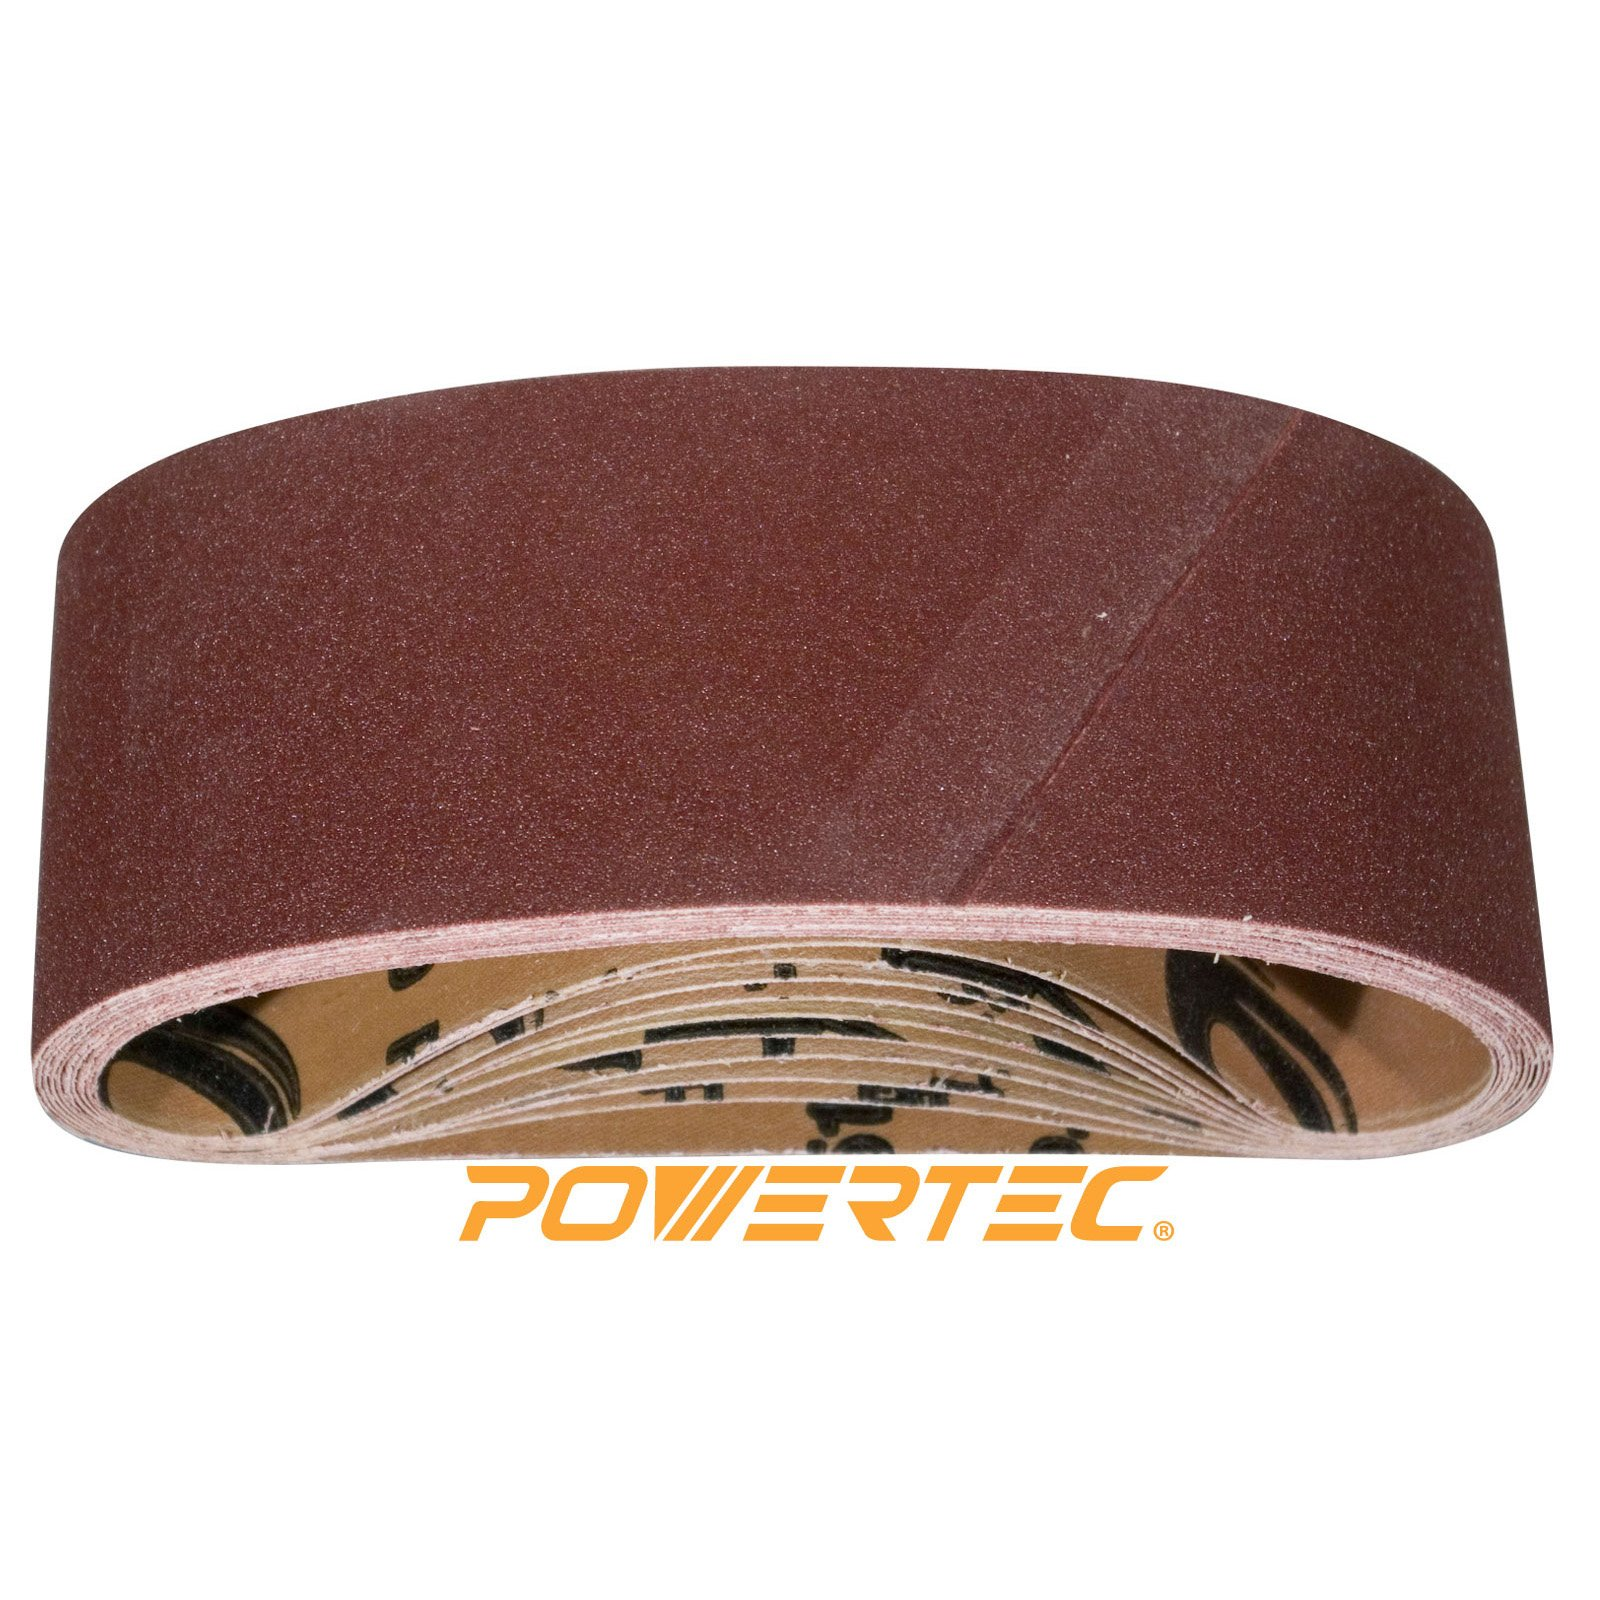 POWERTEC 110090 4-Inch x 24-Inch 80 Grit Aluminum Oxide Sanding Belt, 10-Pack